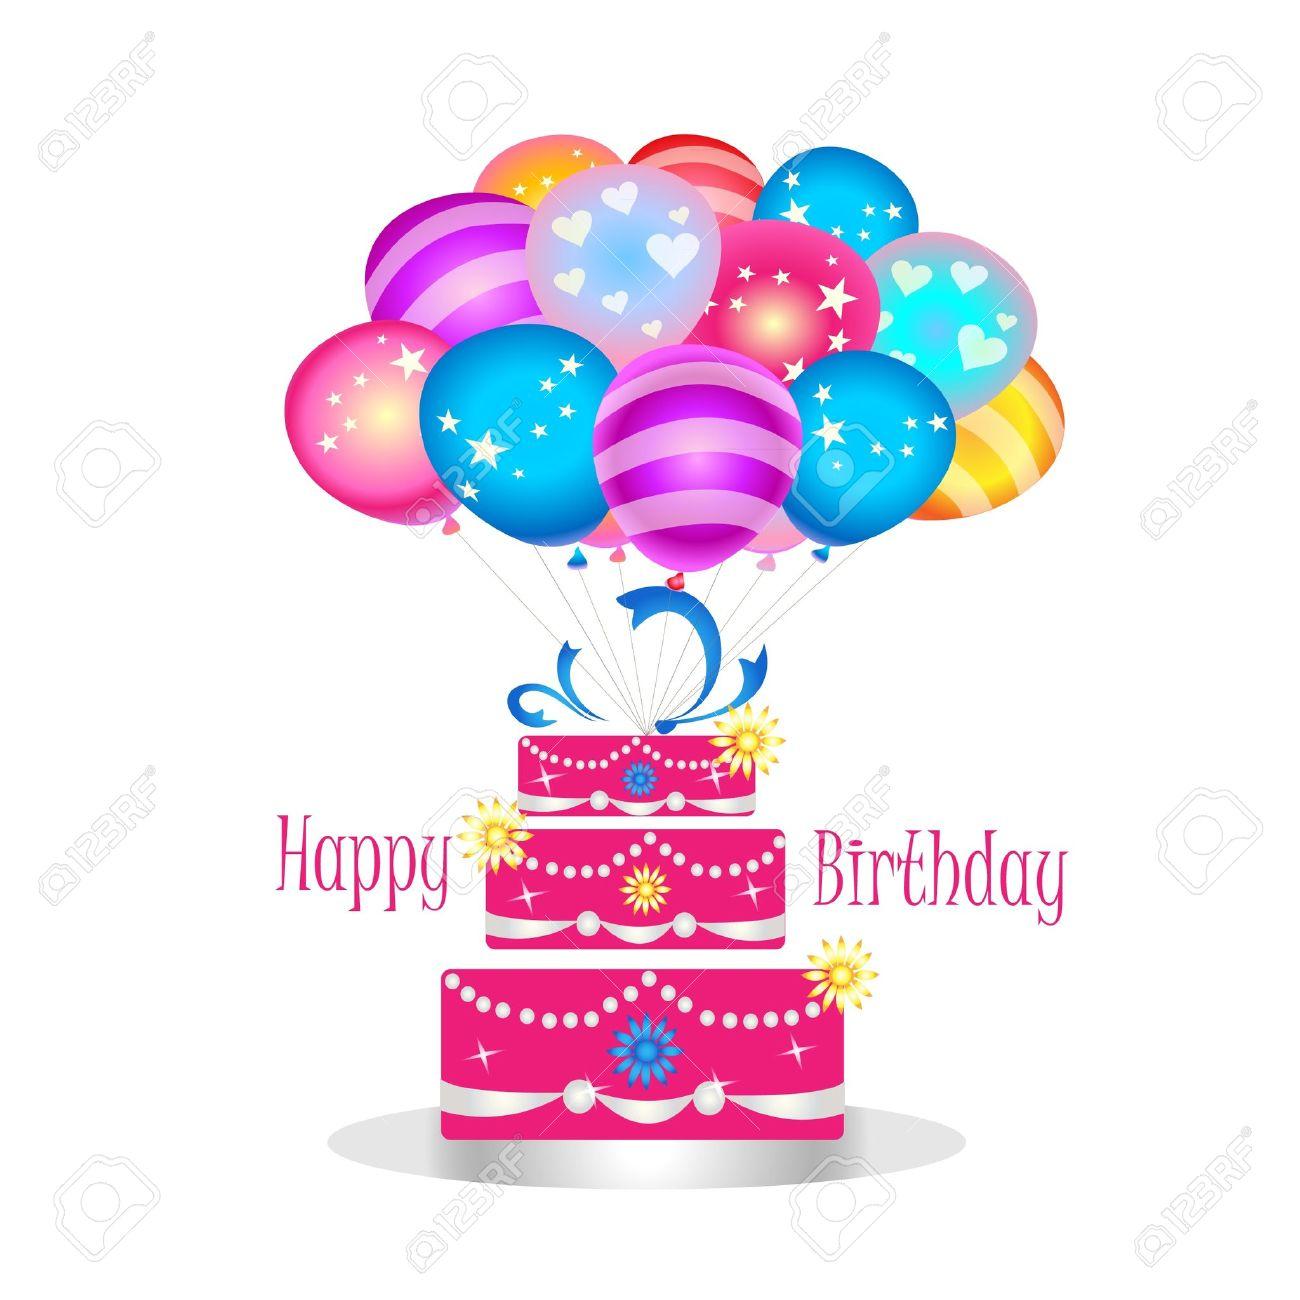 Happy birthday cake with balloons Stock Vector - 12075153